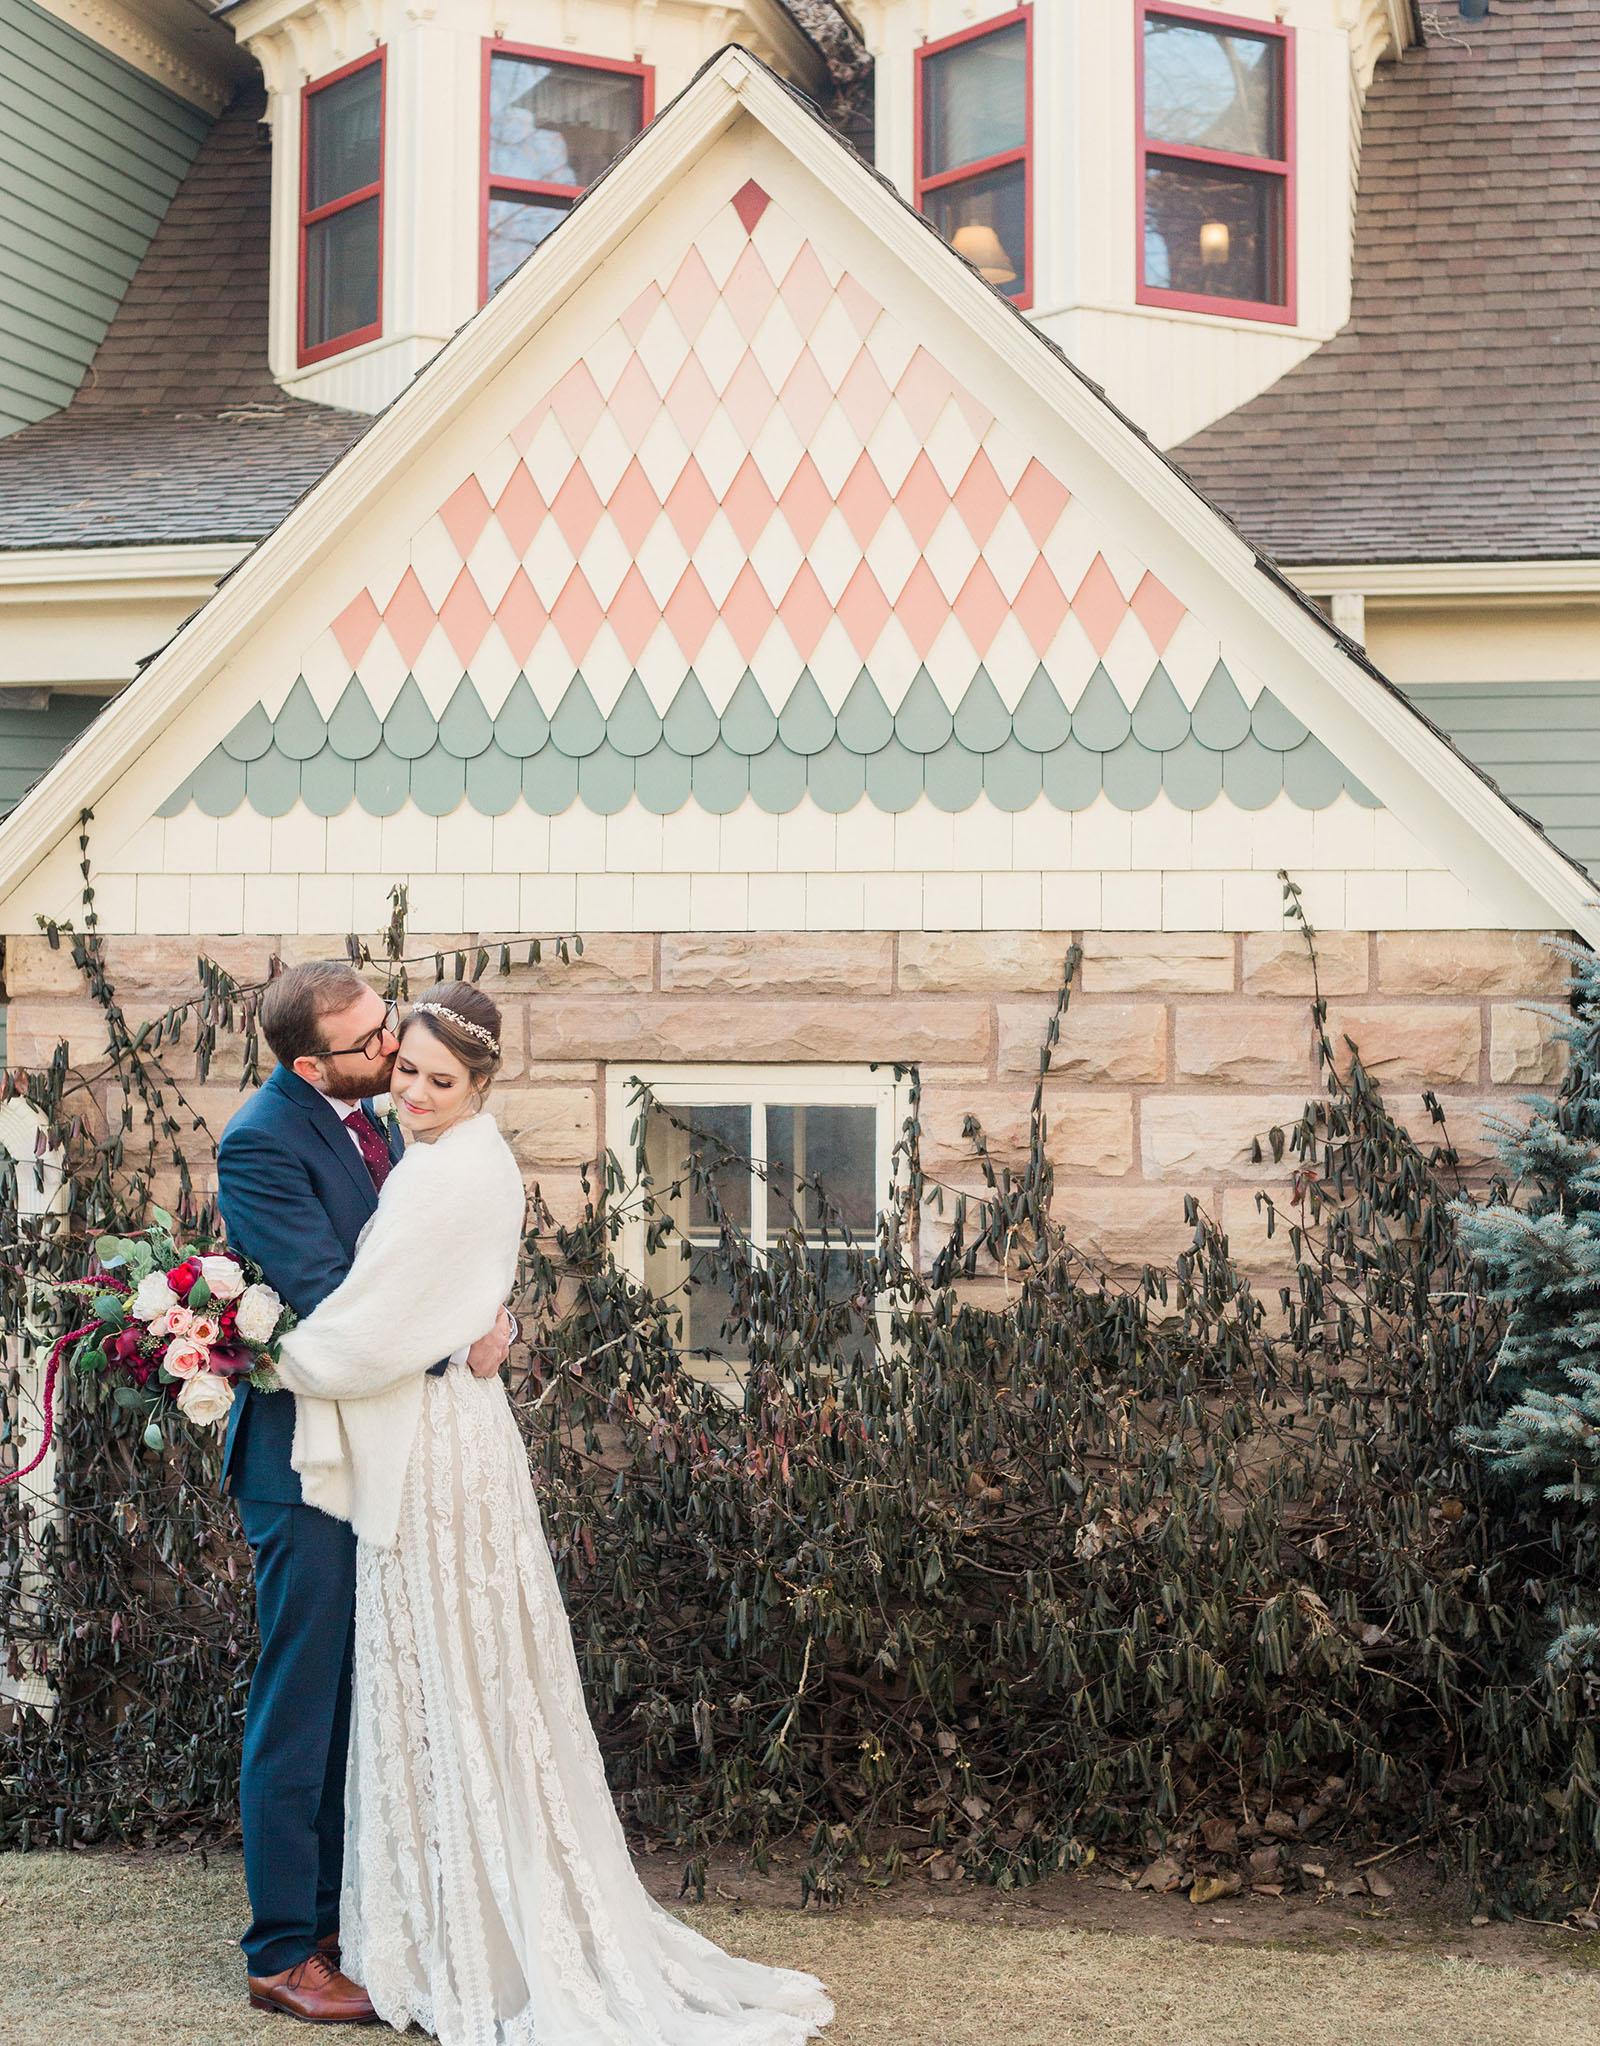 Happy Couple - Tapestry House - Laporte, Colorado - Larmier County - Wedgewood Weddings